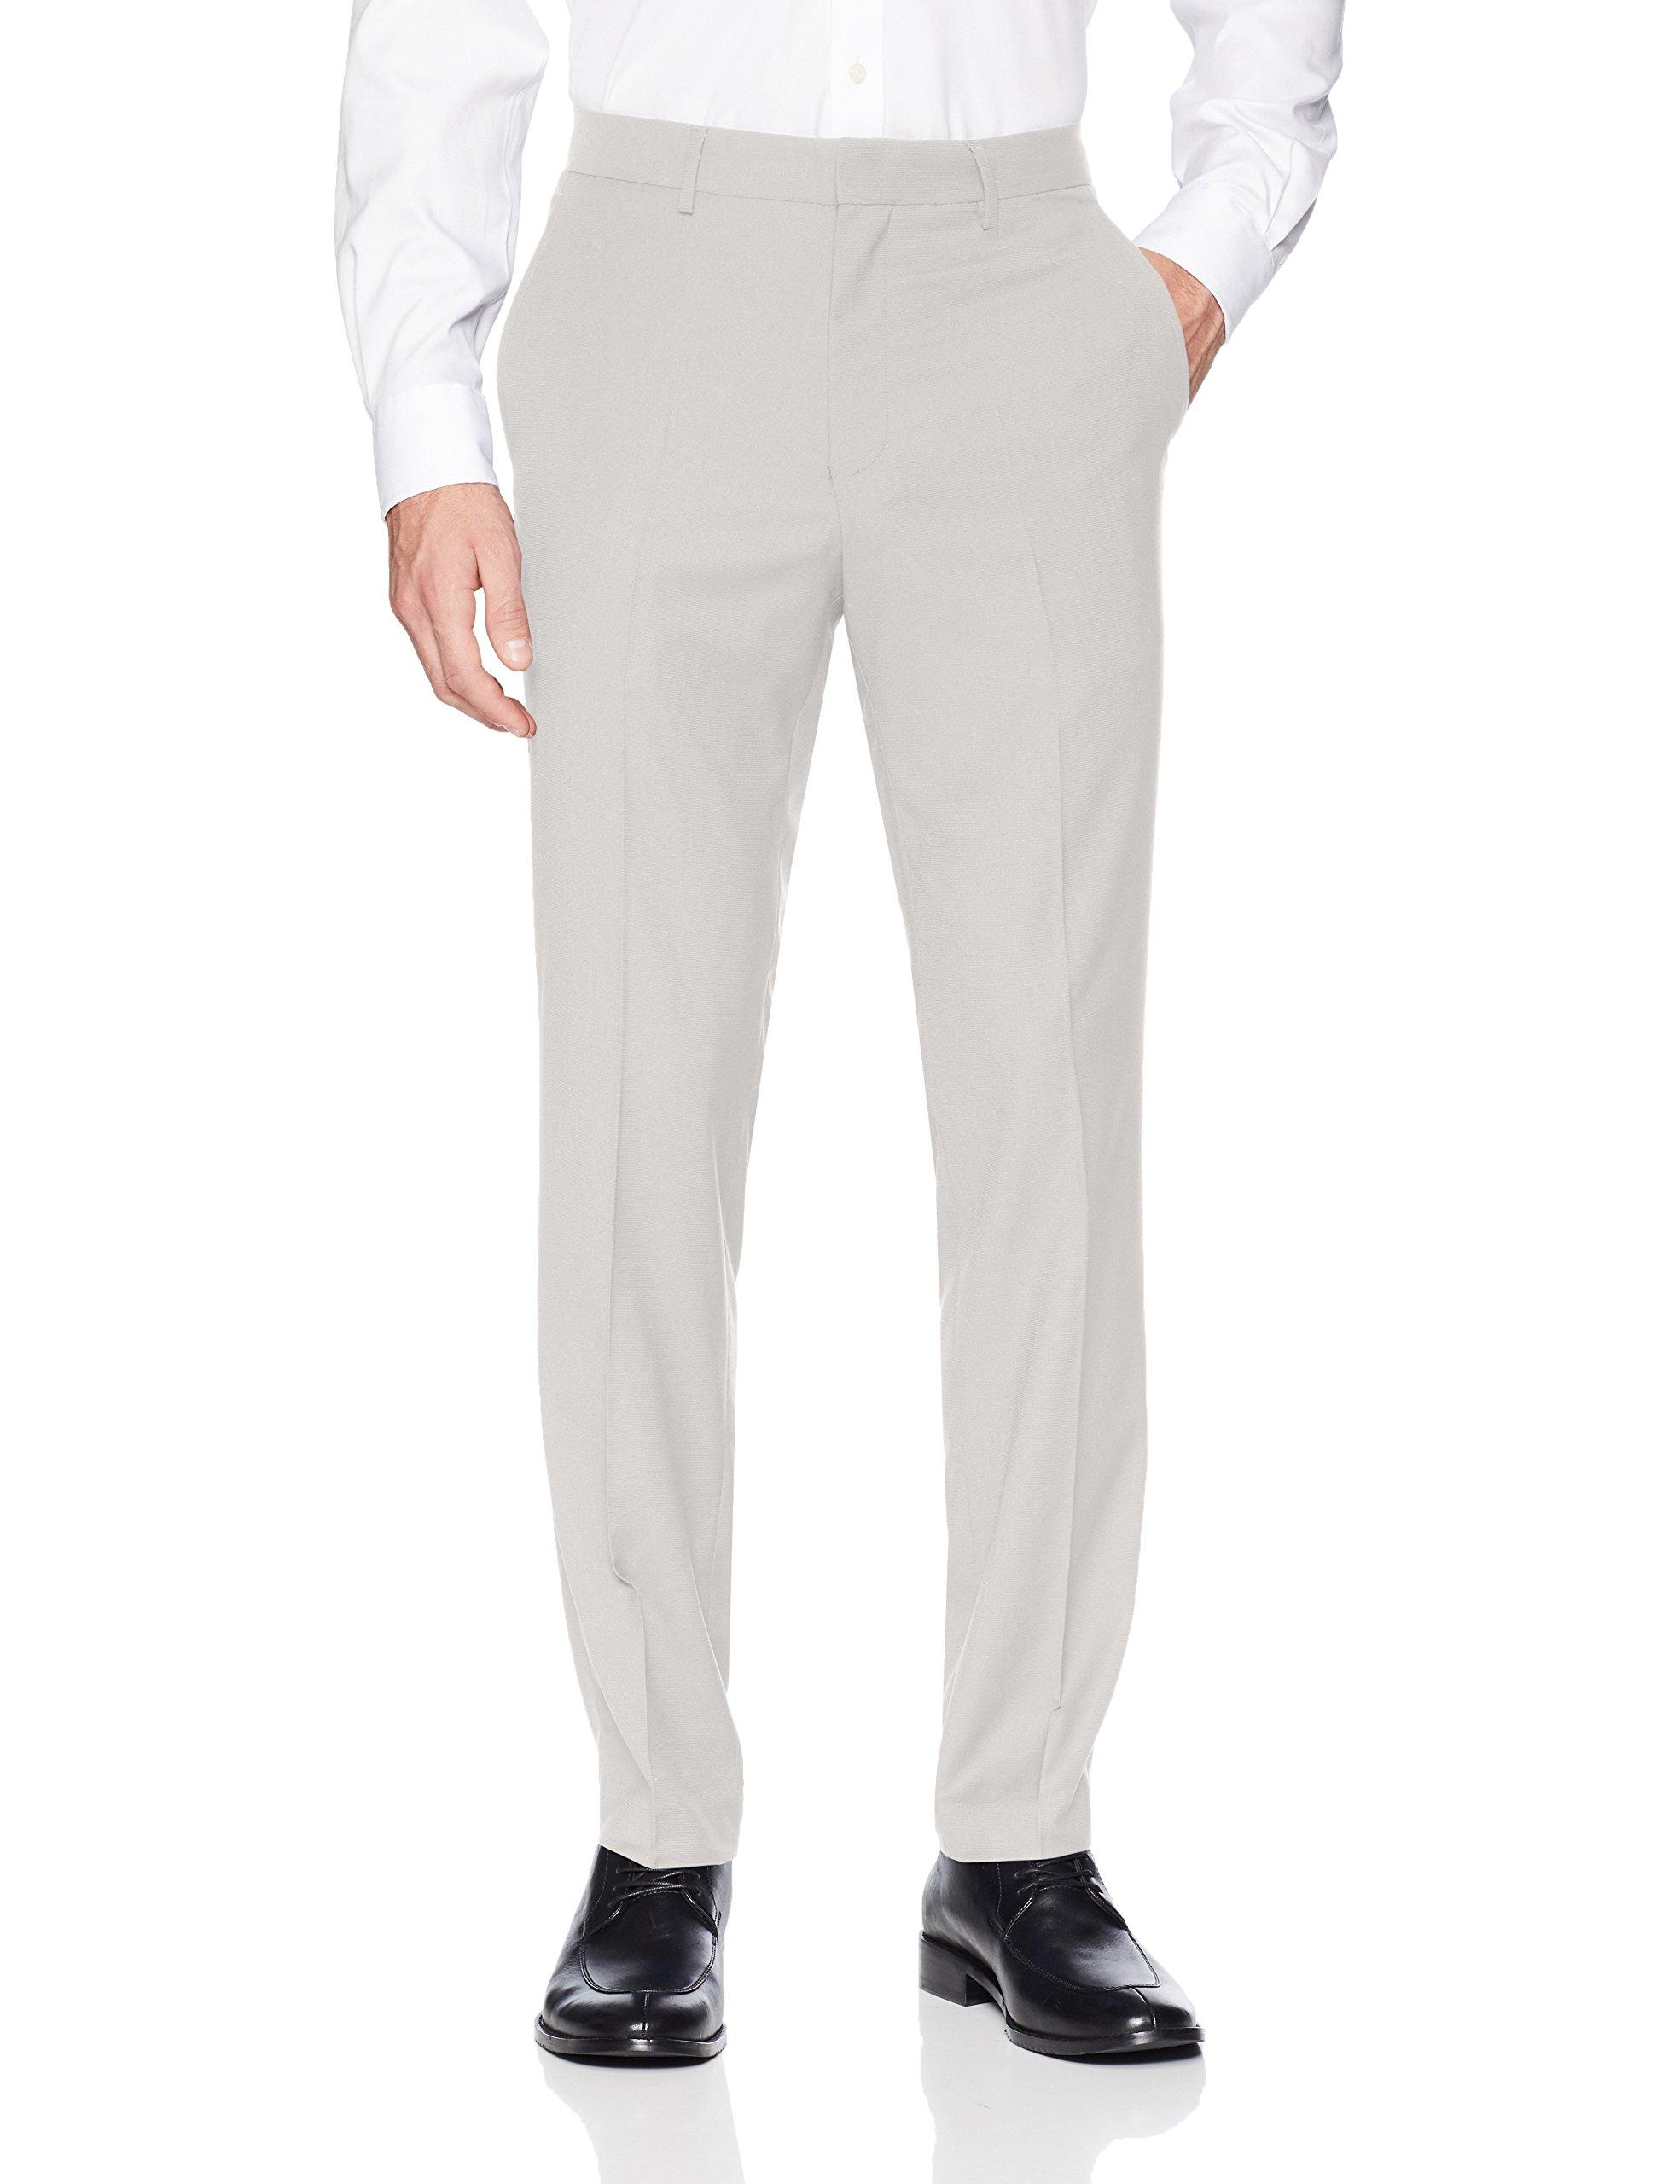 Kenneth Cole REACTION Men's Techni-Cole Stretch Slim Fit Suit Separate Pant (Blazer,  and Vest), Light Grey Basketweave, 34x32 by Kenneth Cole REACTION